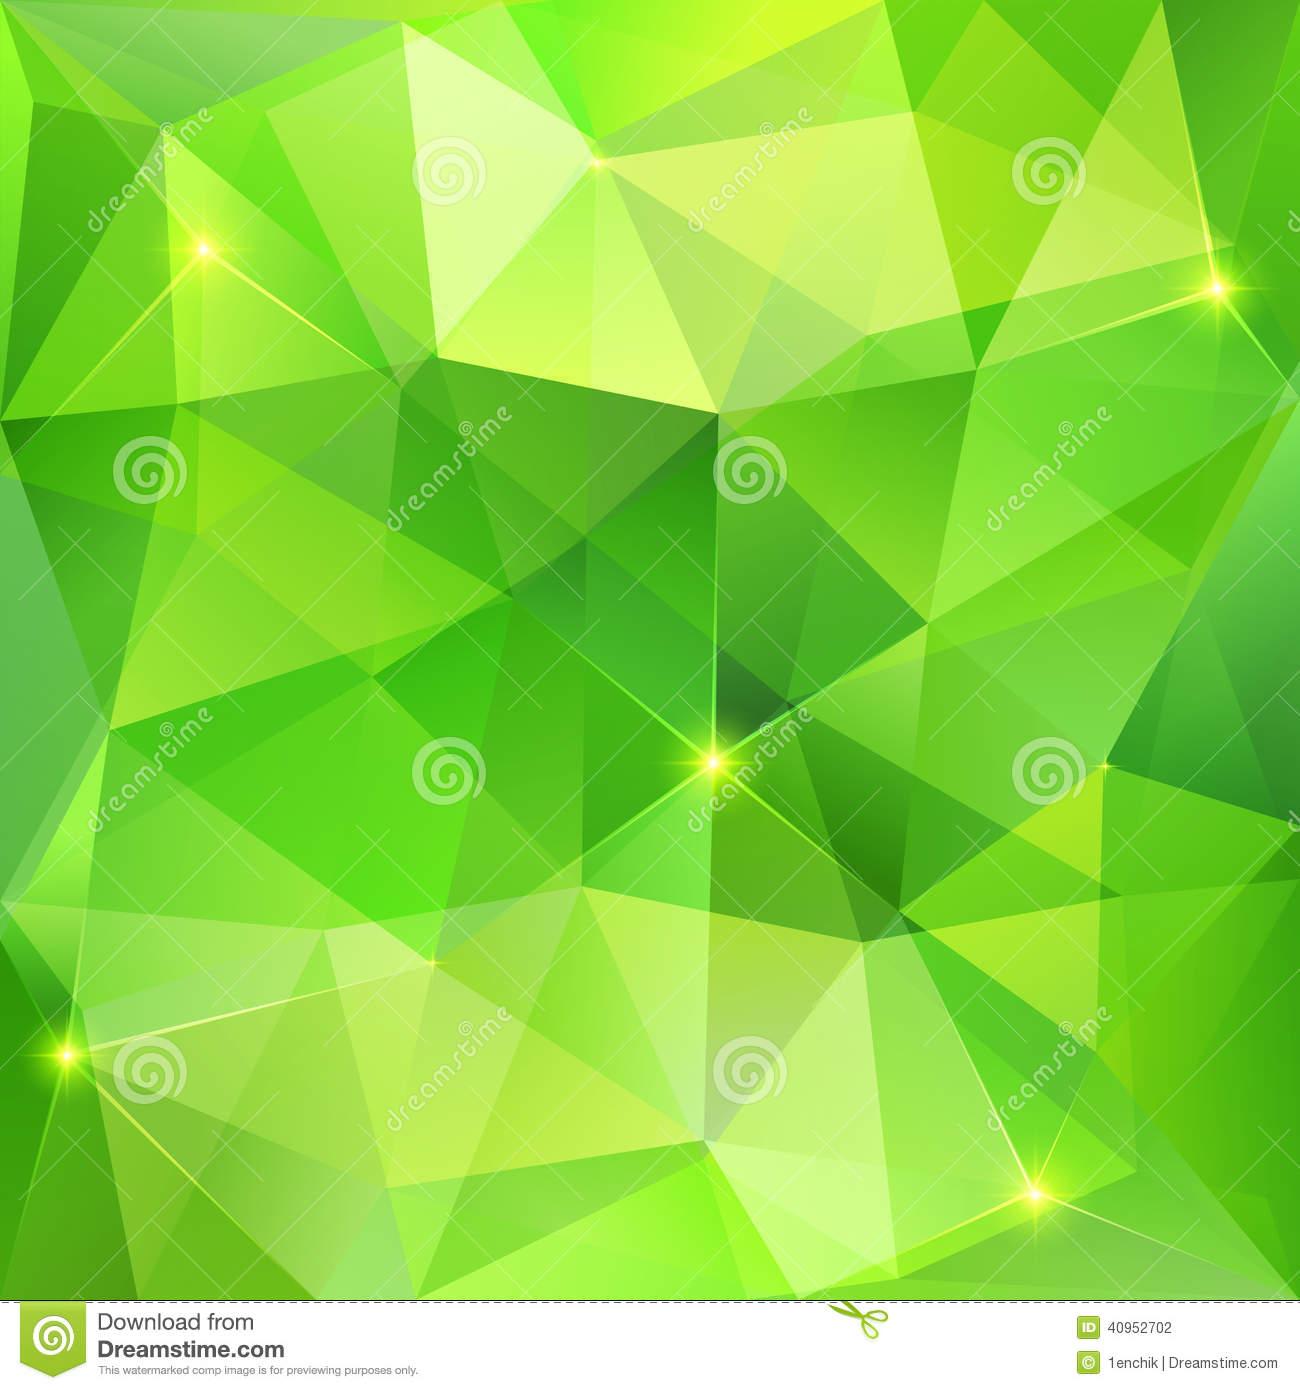 Temporary Fabric Wallpaper Emerald Green Wallpaper Wallpapersafari